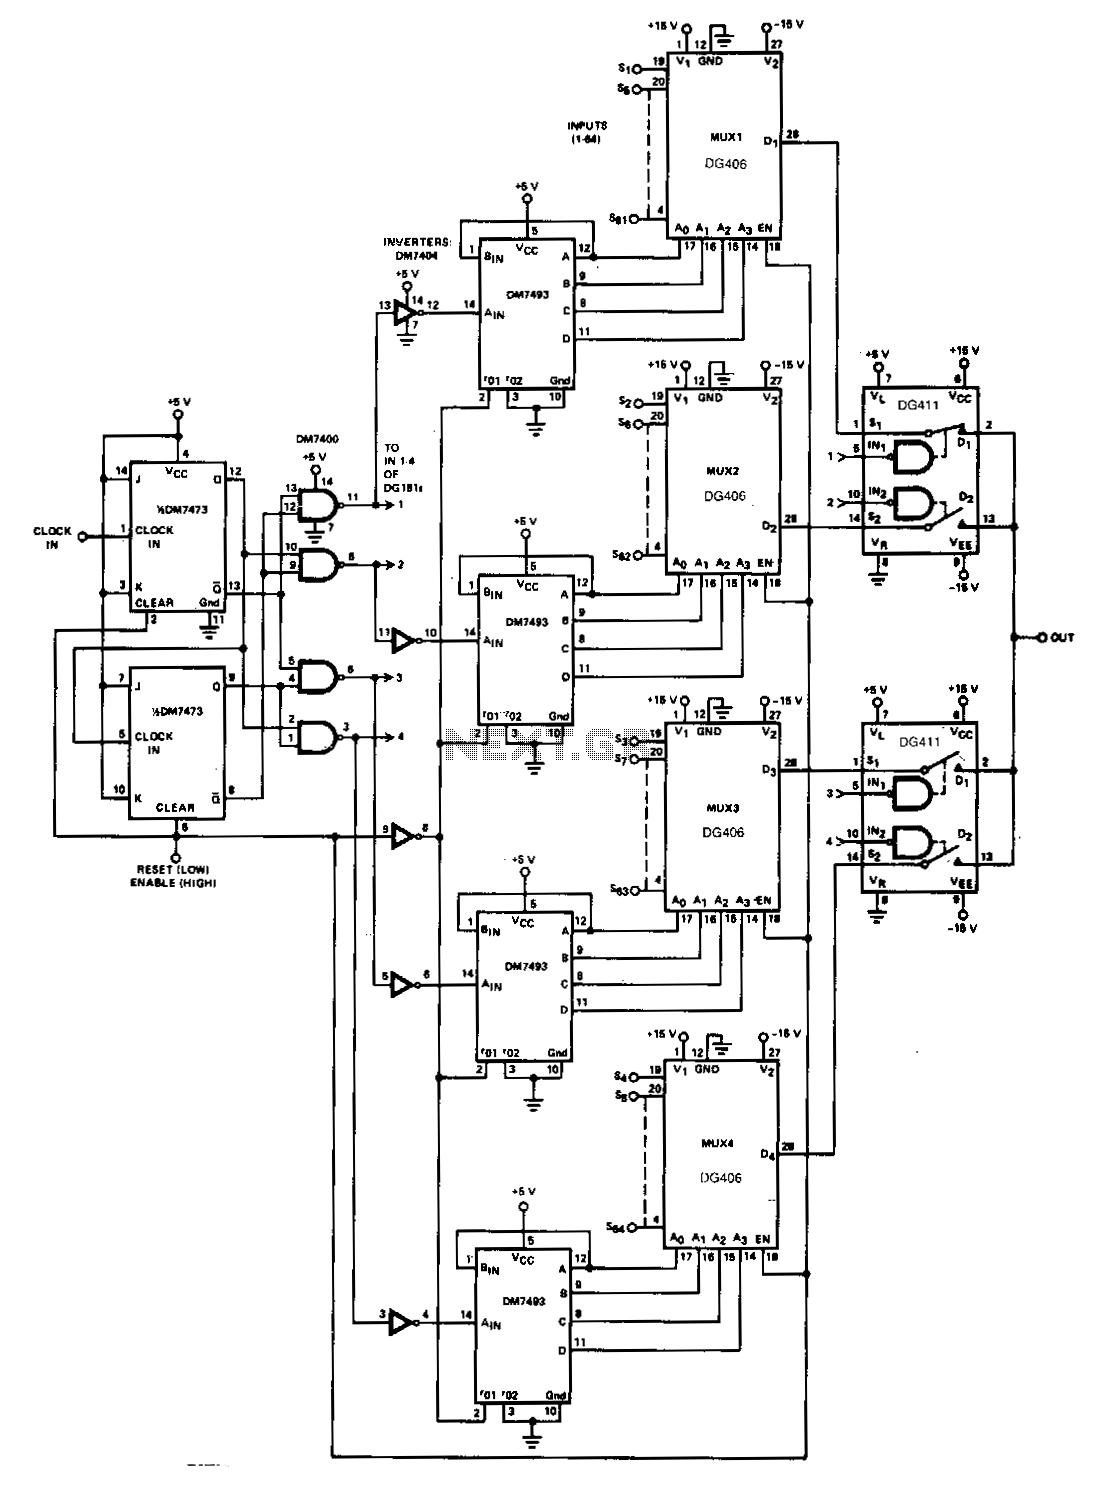 Gt Digital Gt Logic Circuits Gt Two Level Multiplexer L